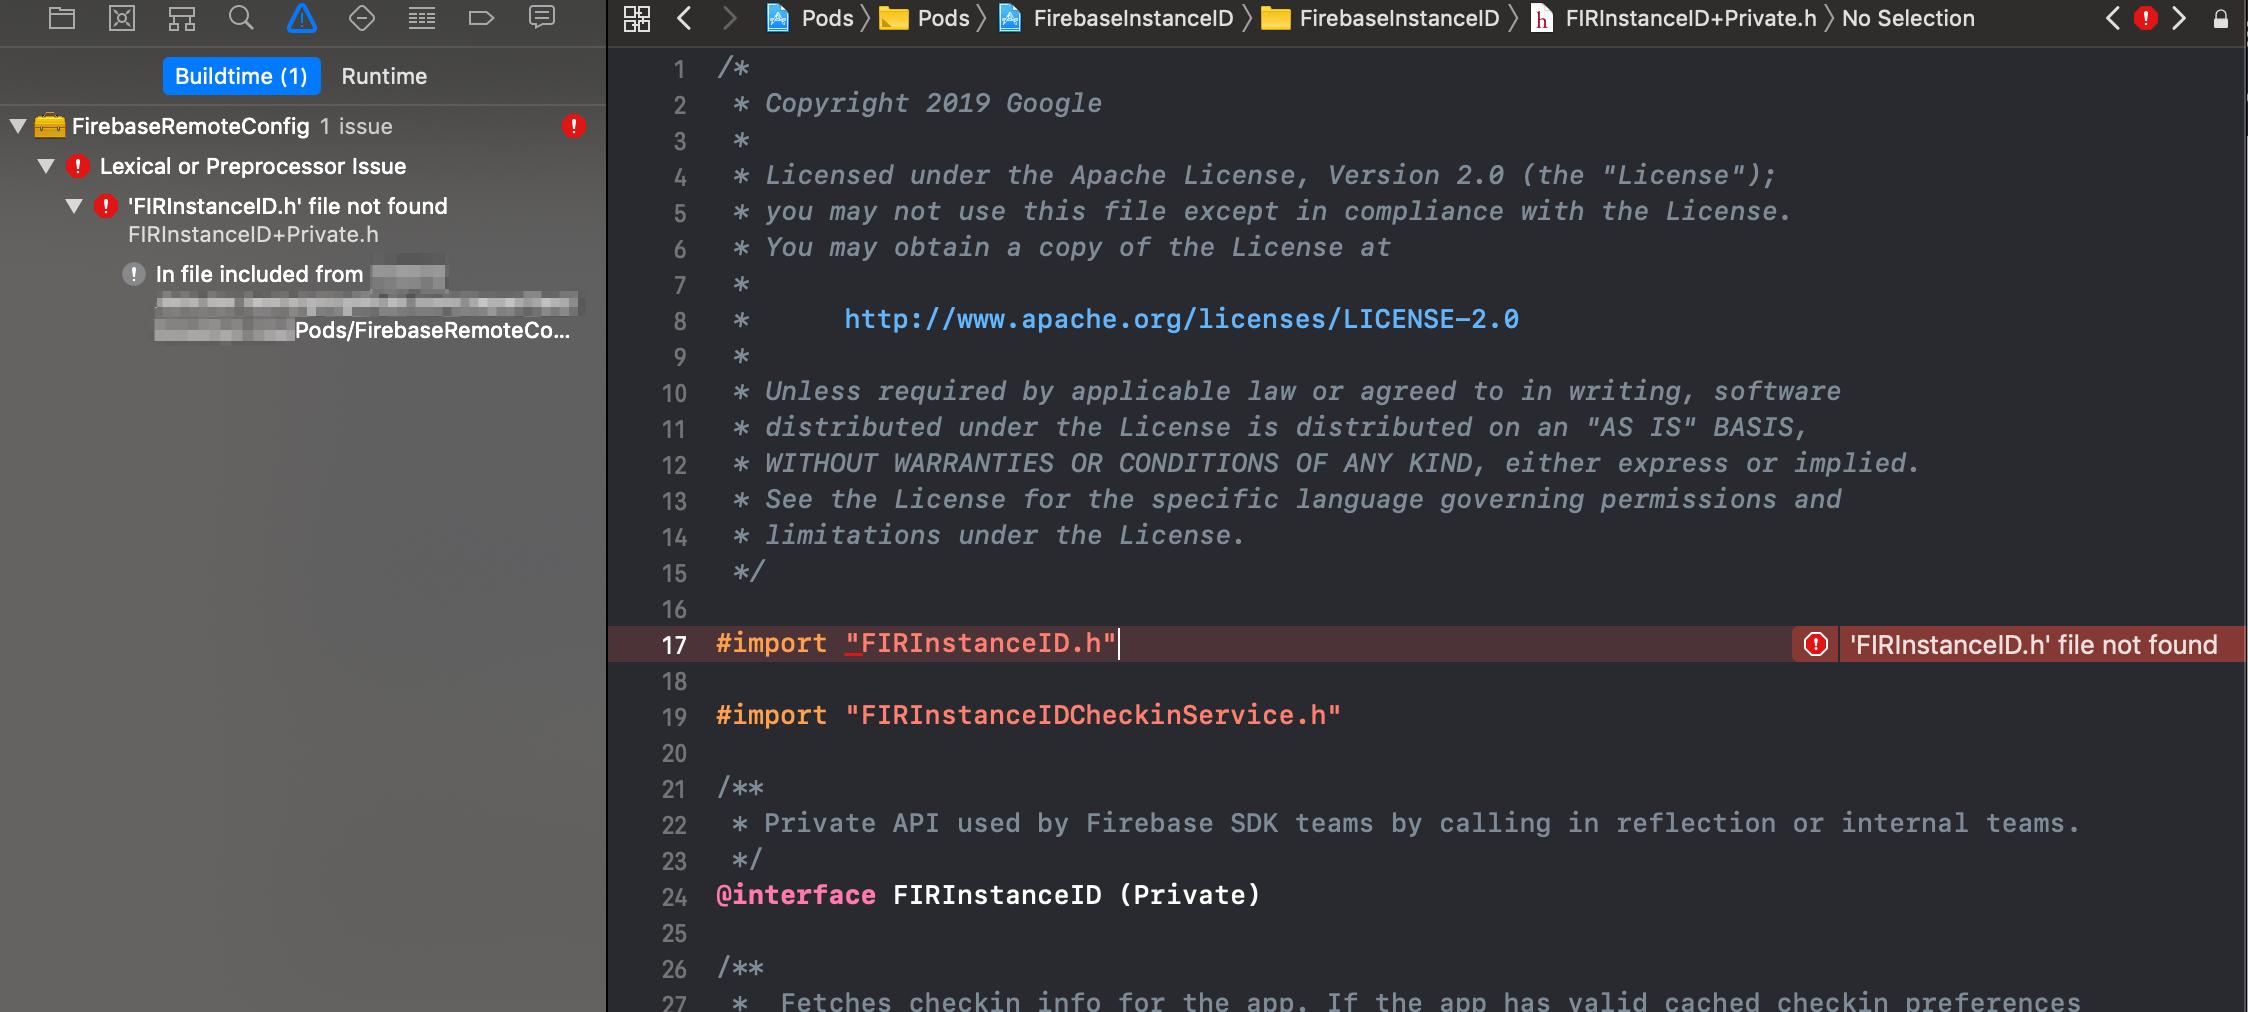 FIRInstanceID_Private_h_と_New_Issue_·_firebase_firebase-ios-sdk